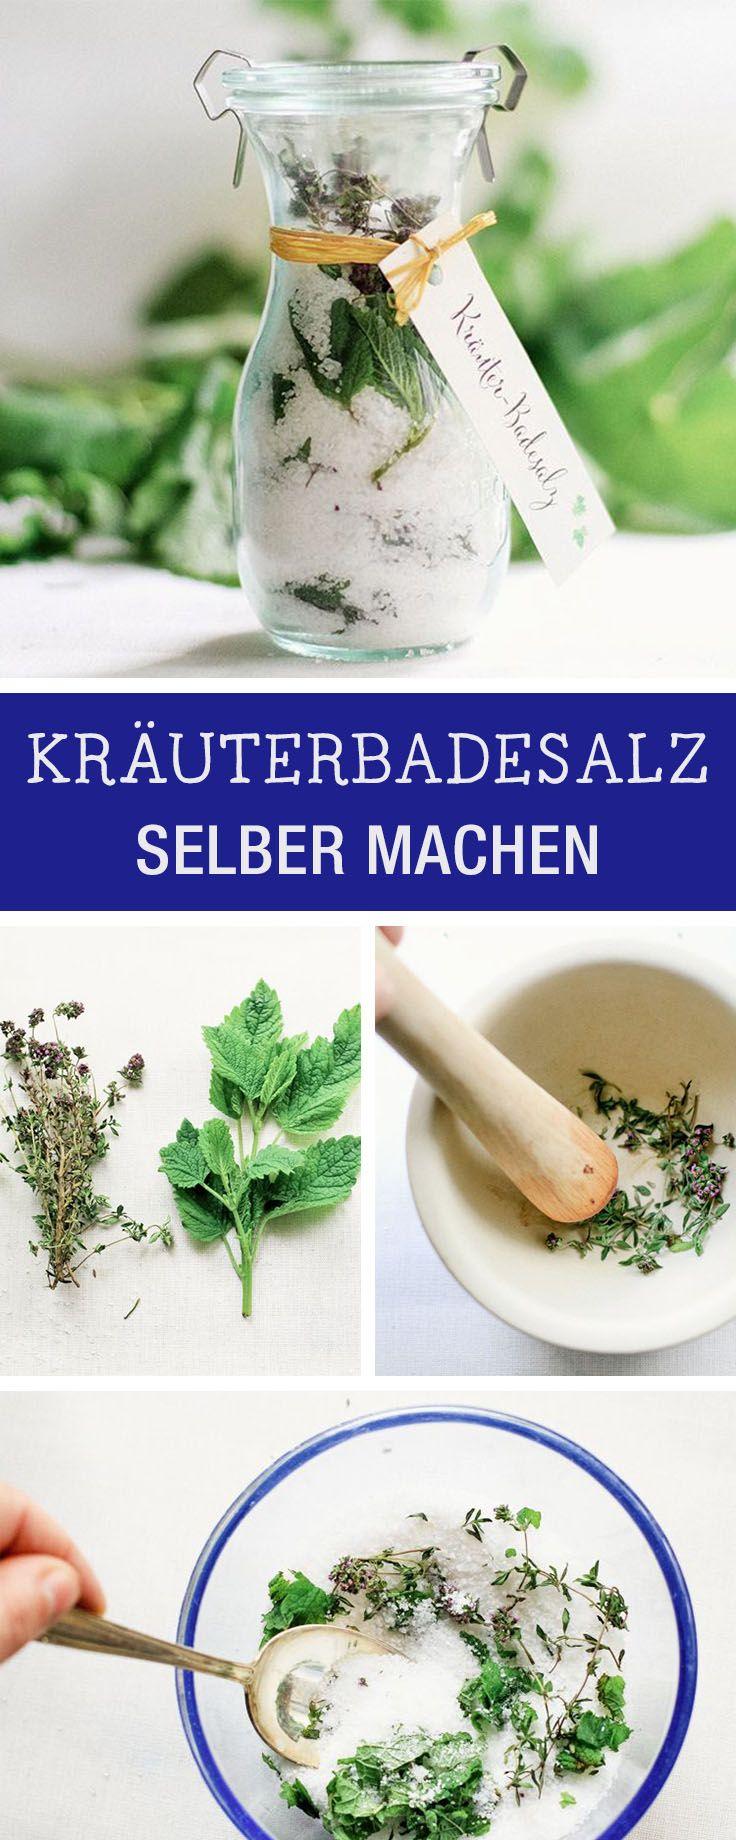 Beauty DIY: Badesalz mit aromatischen Kräutern selbermachen / wellness diy: homemade bath salts with herbs via DaWanda.com